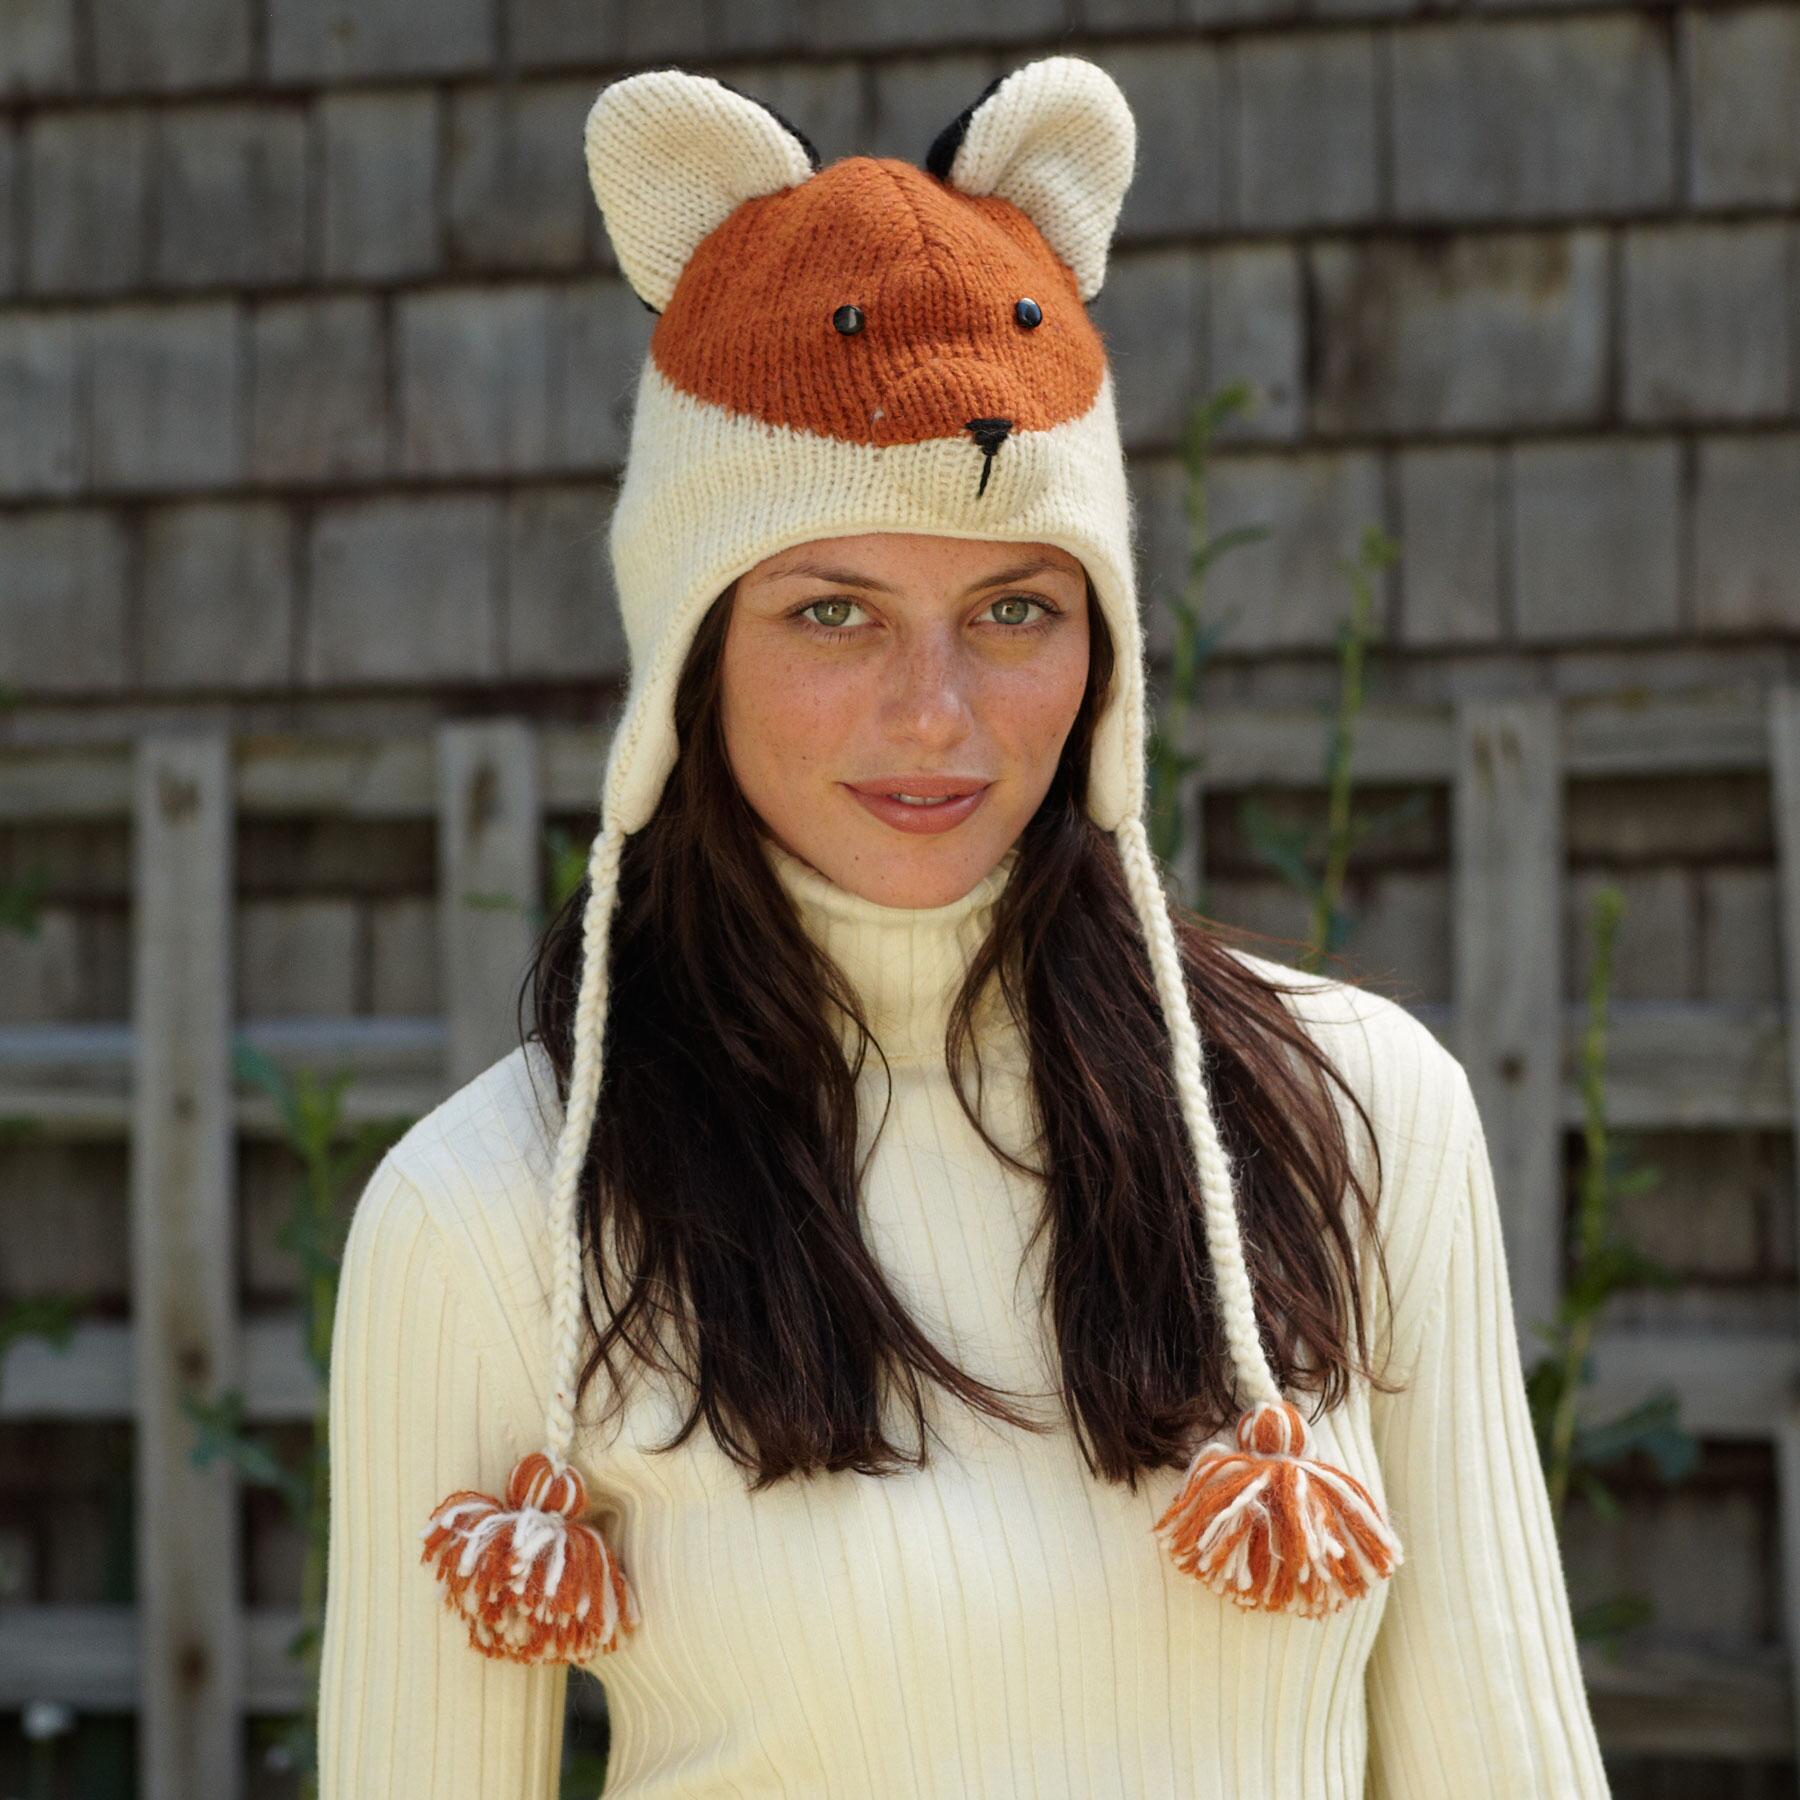 FEISTY FOX HAT: View 2